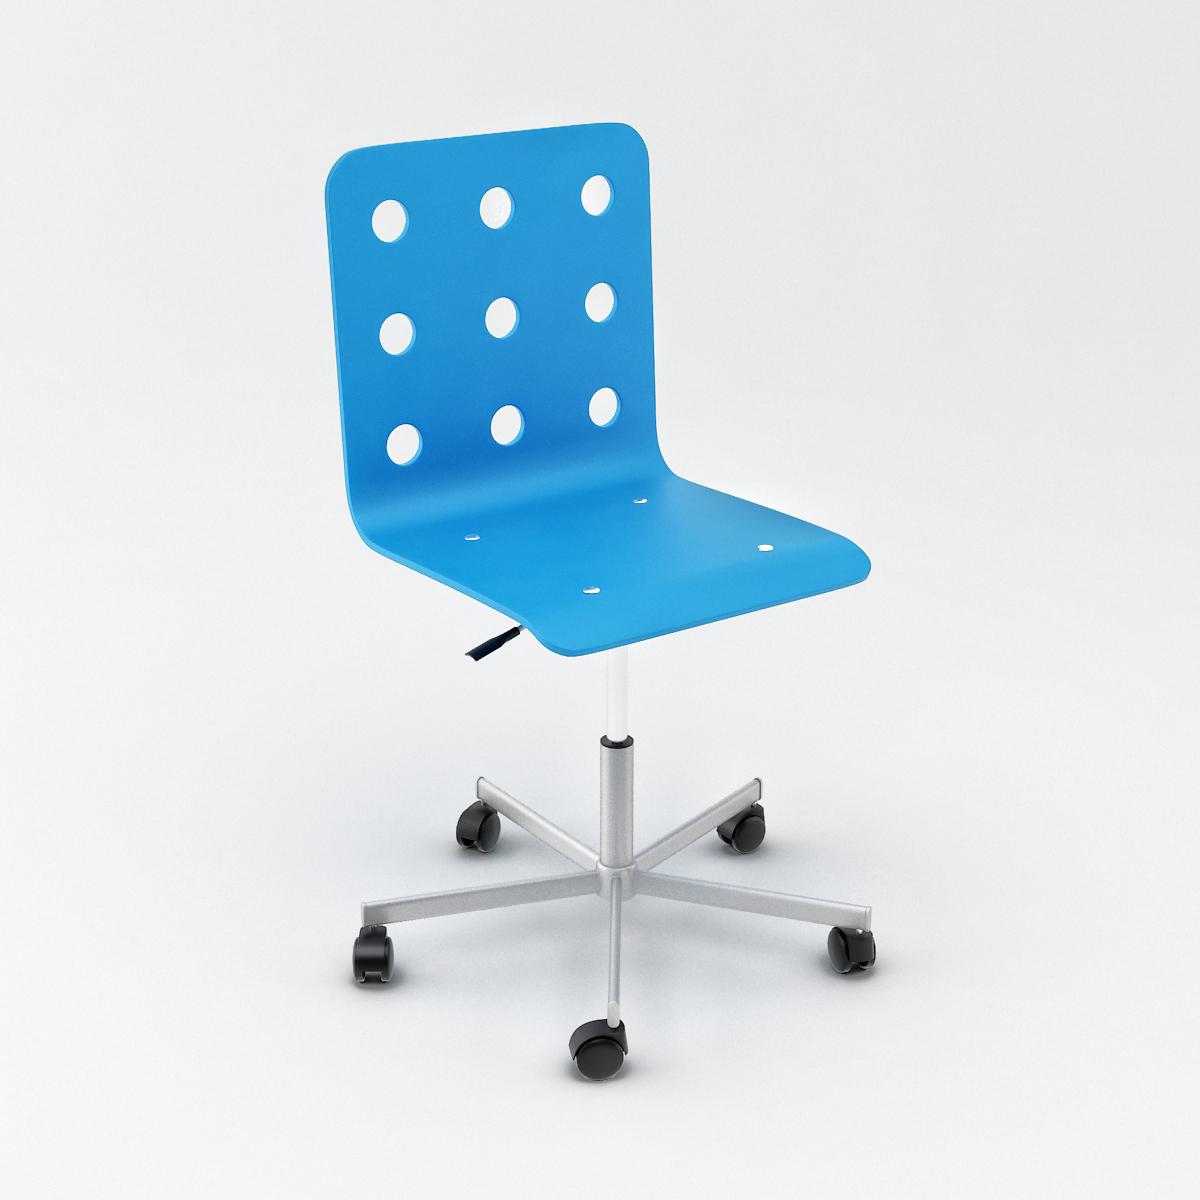 Admirable Jules Swivel Chair Inzonedesignstudio Interior Chair Design Inzonedesignstudiocom